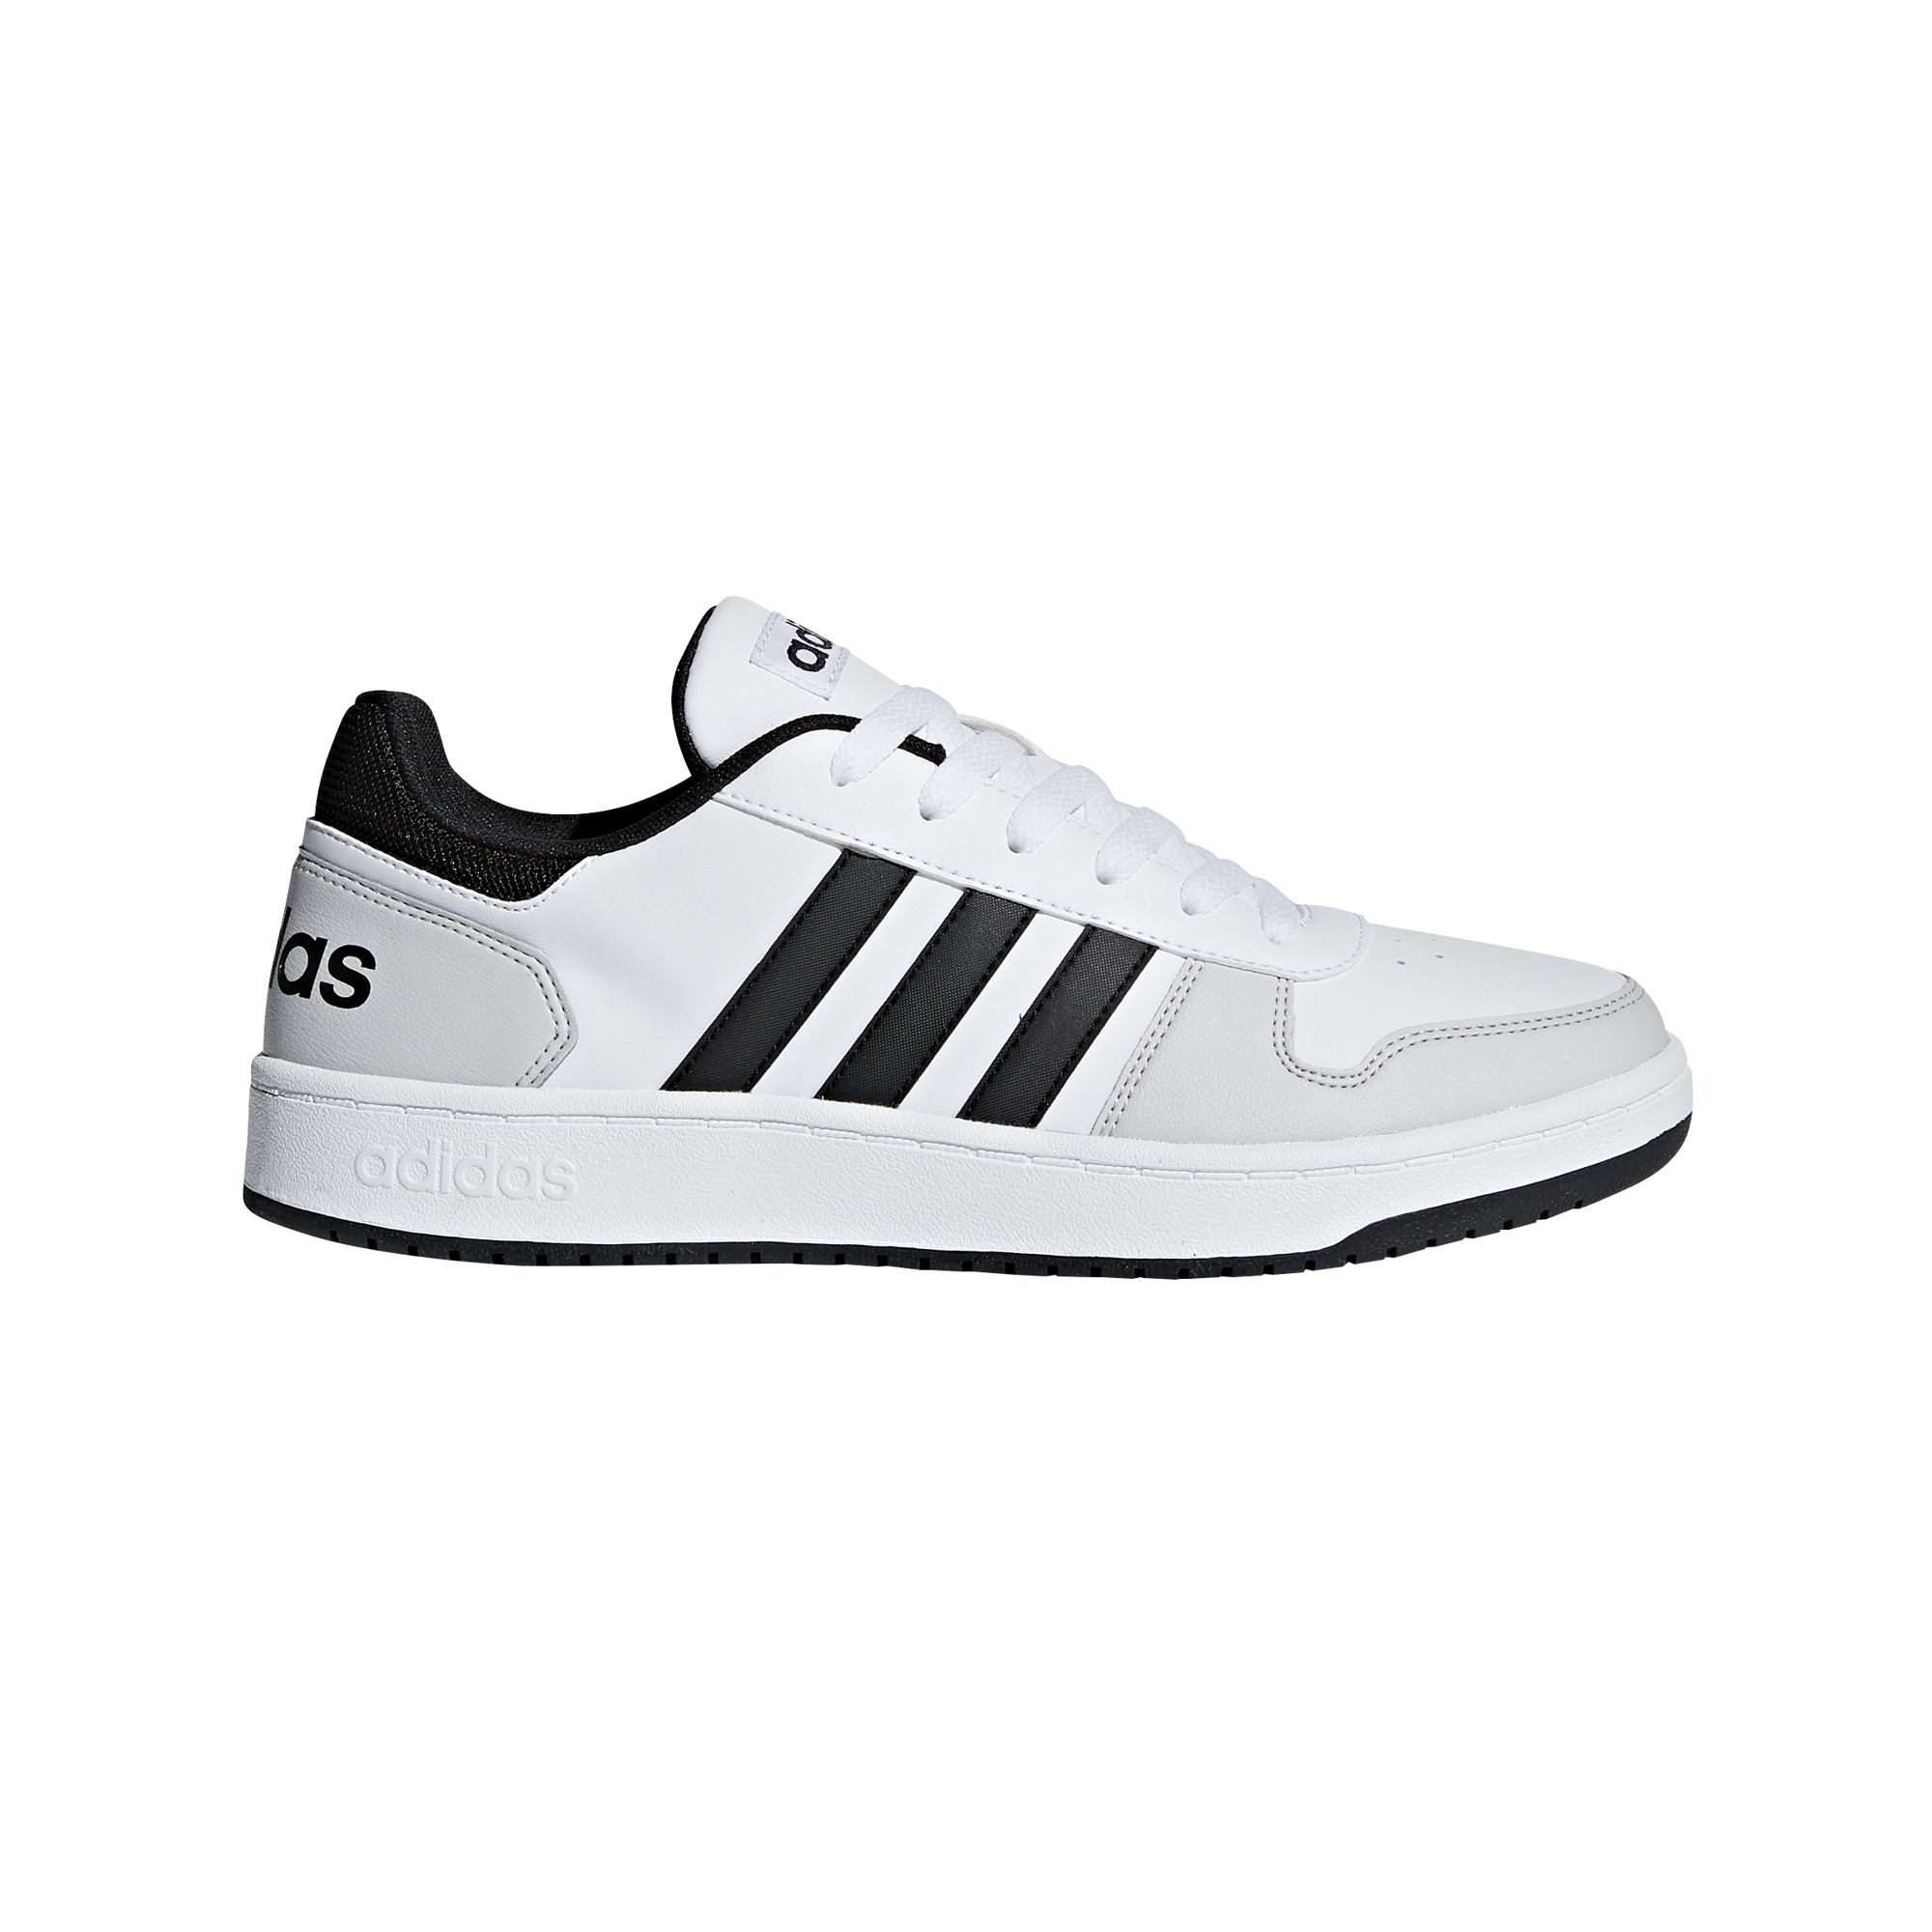 9998b759ee Adidas férfi cipő HOOPS 2.0 | Markasbolt.hu Hivatalos ADIDAS forgalmazó